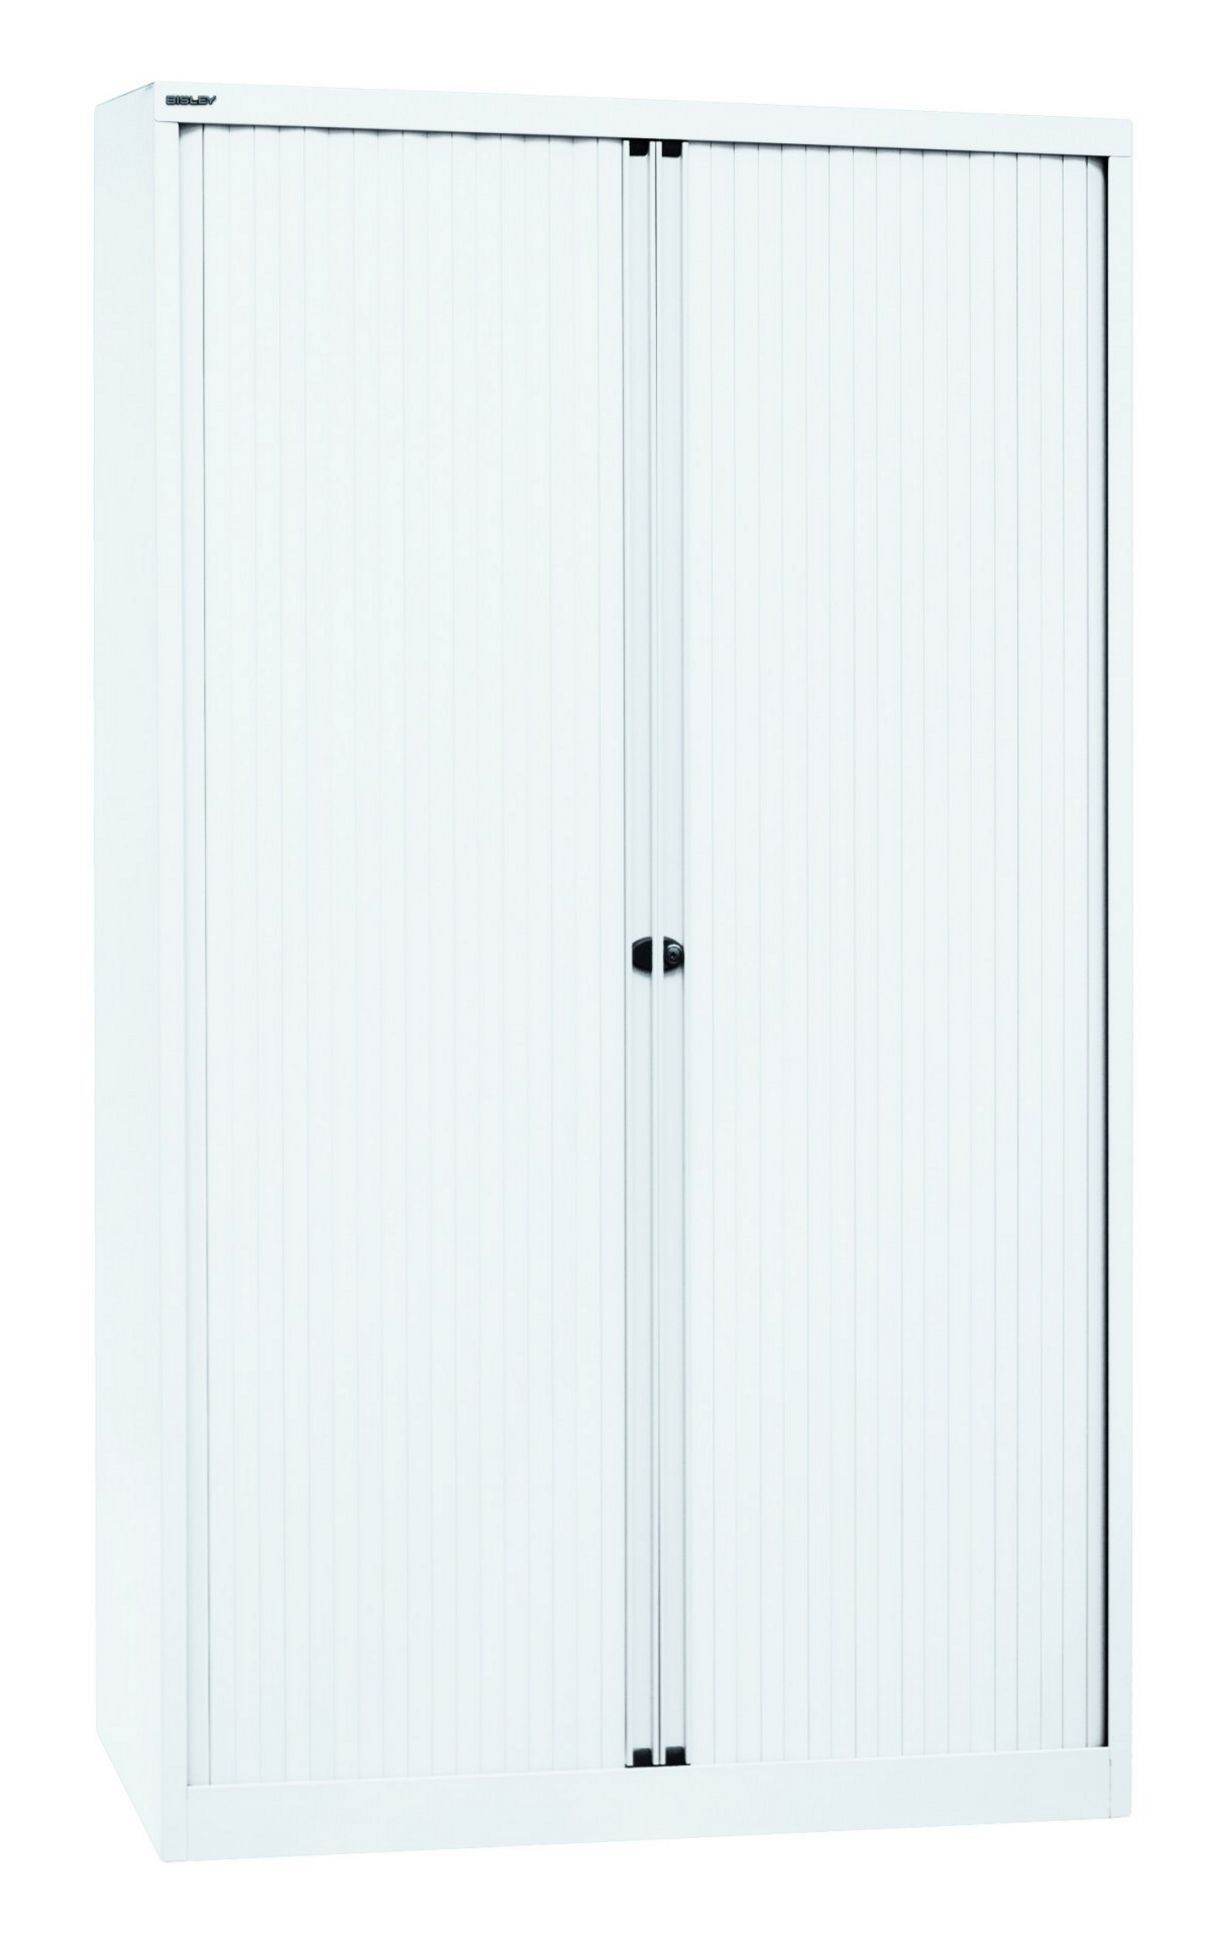 abschließbarer Rollladen-Büroschrank aus Stahl weiß